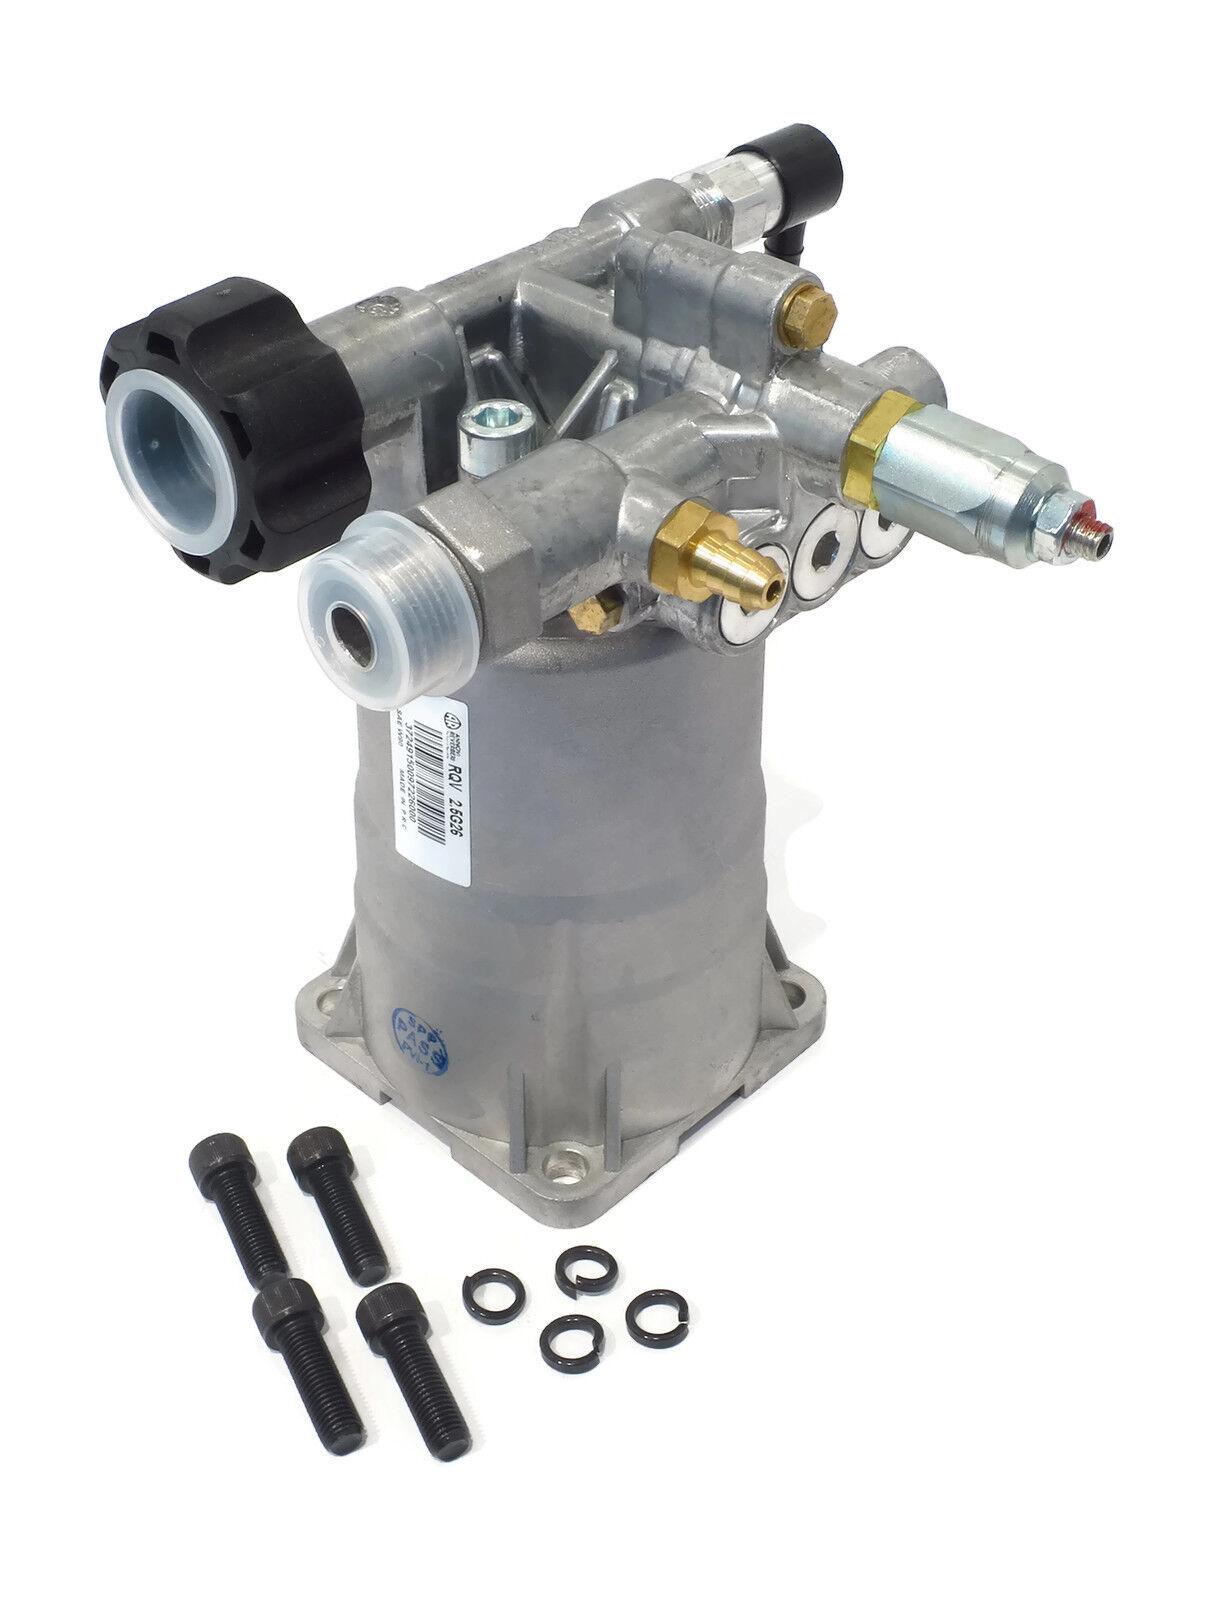 Nuevo 2600 PSI Hidrolimpiadora Bomba De Agua Sears Craftsman 580.751500 580.751510